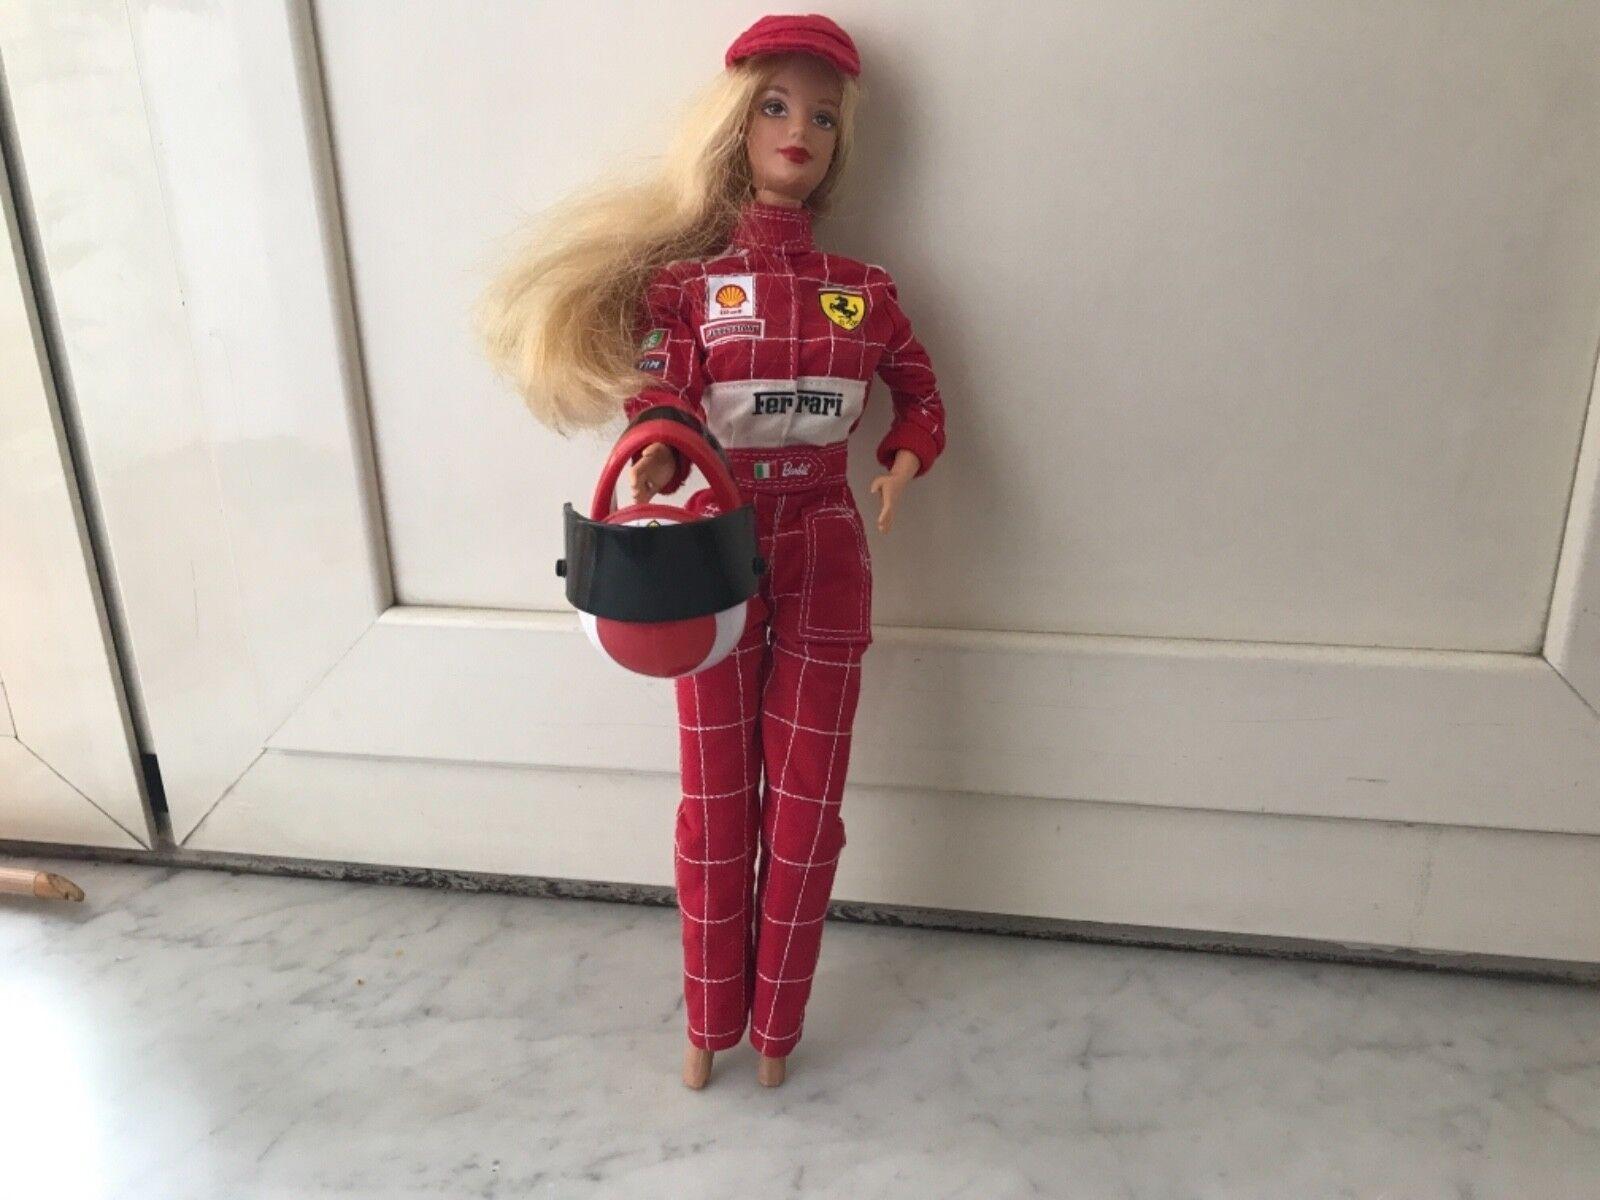 Barbie doll Scuderia Ferrari 2000 Mattel Mattel Mattel 25636 NRFB buonissima condizione 4df2e5